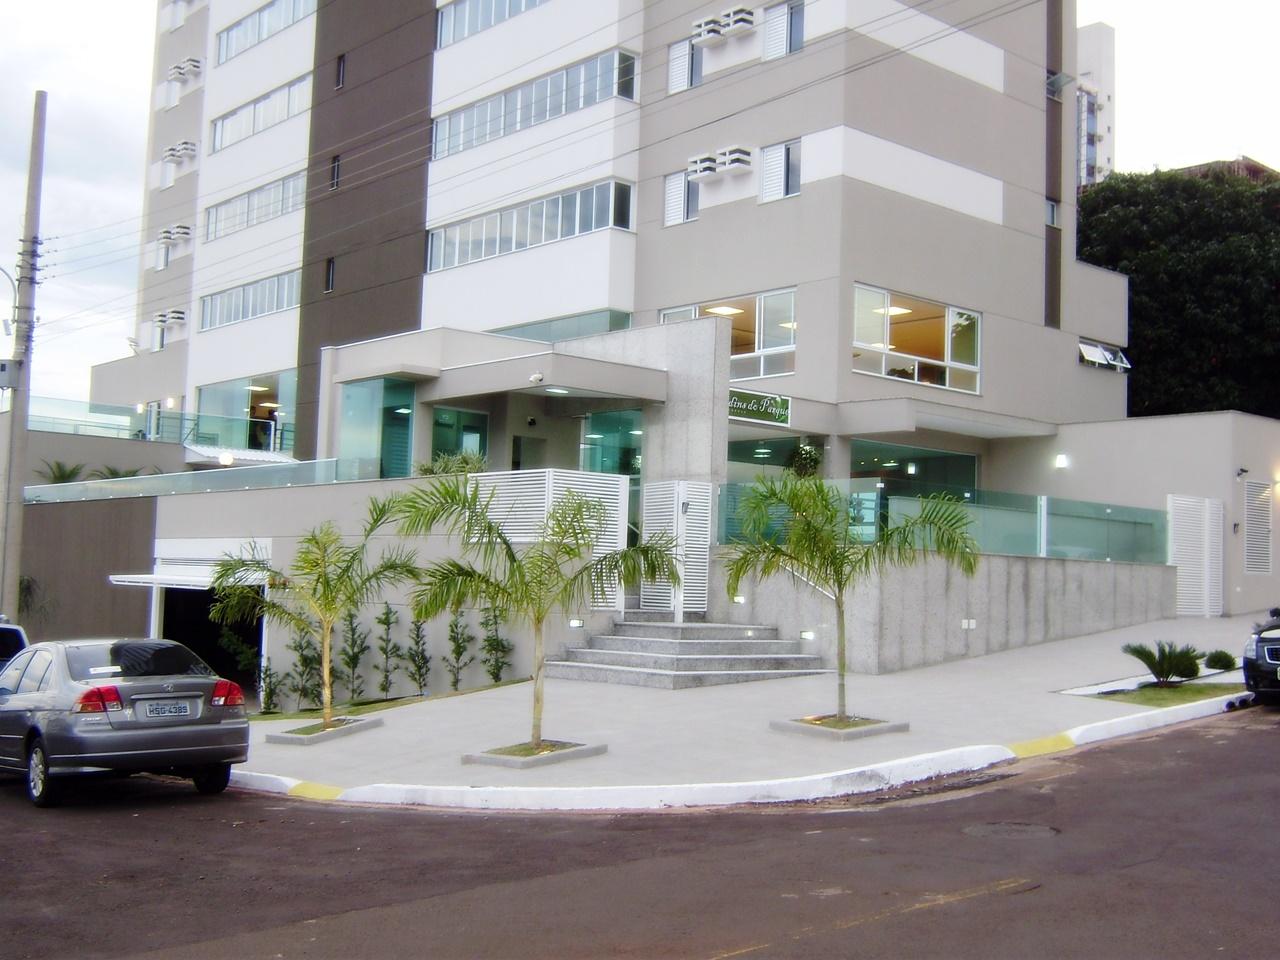 Jardins_do_parque_campo_grande_ms_arquitetura_edificio_residencial